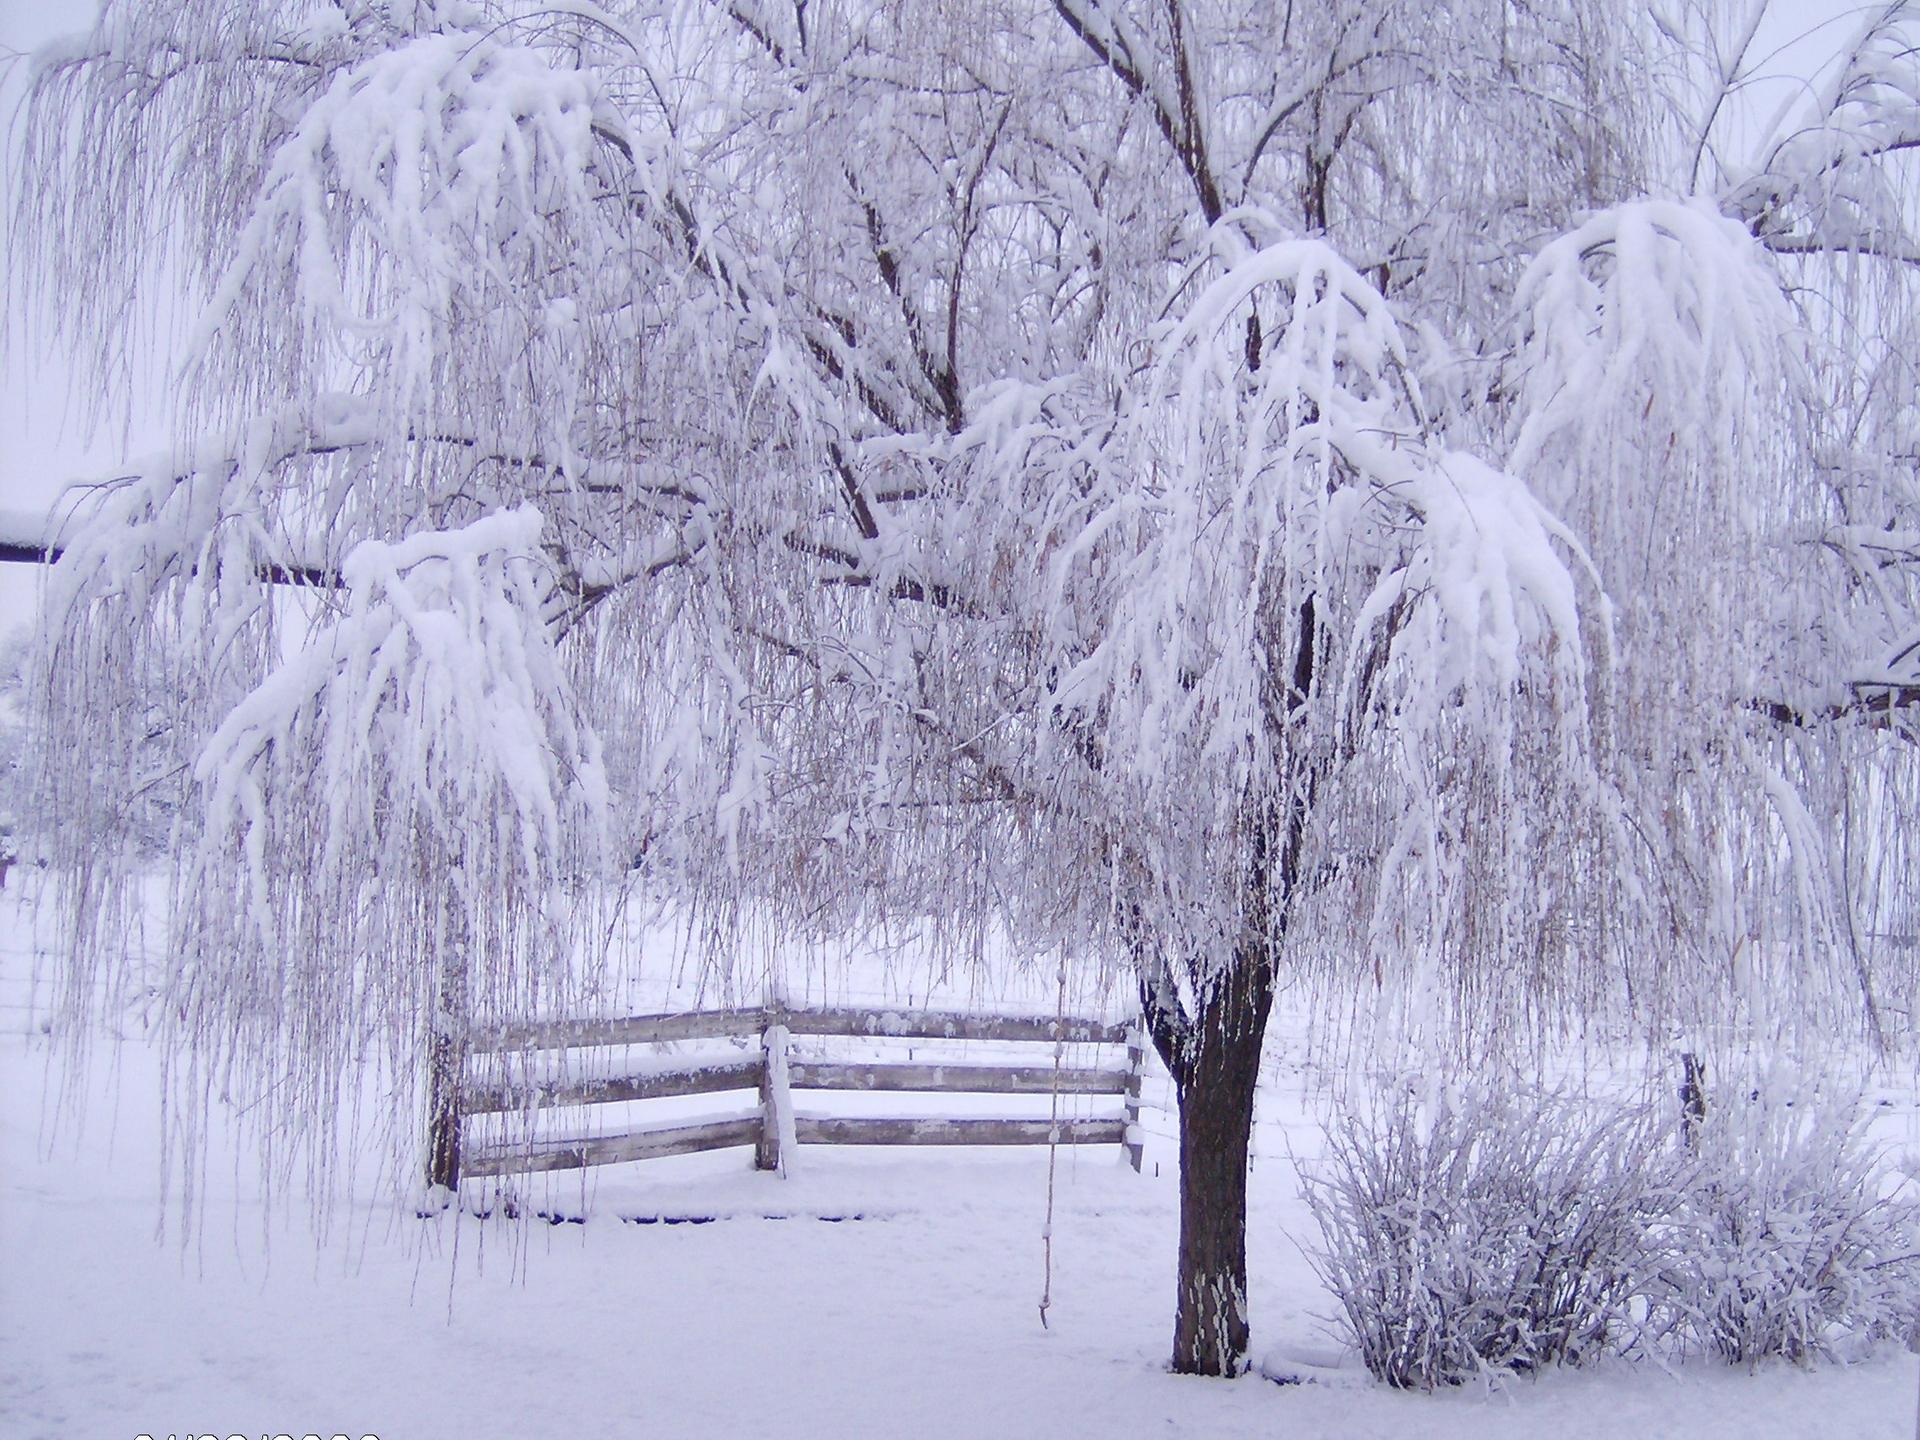 winter landscape wallpapers.winter wallpapers free download ...